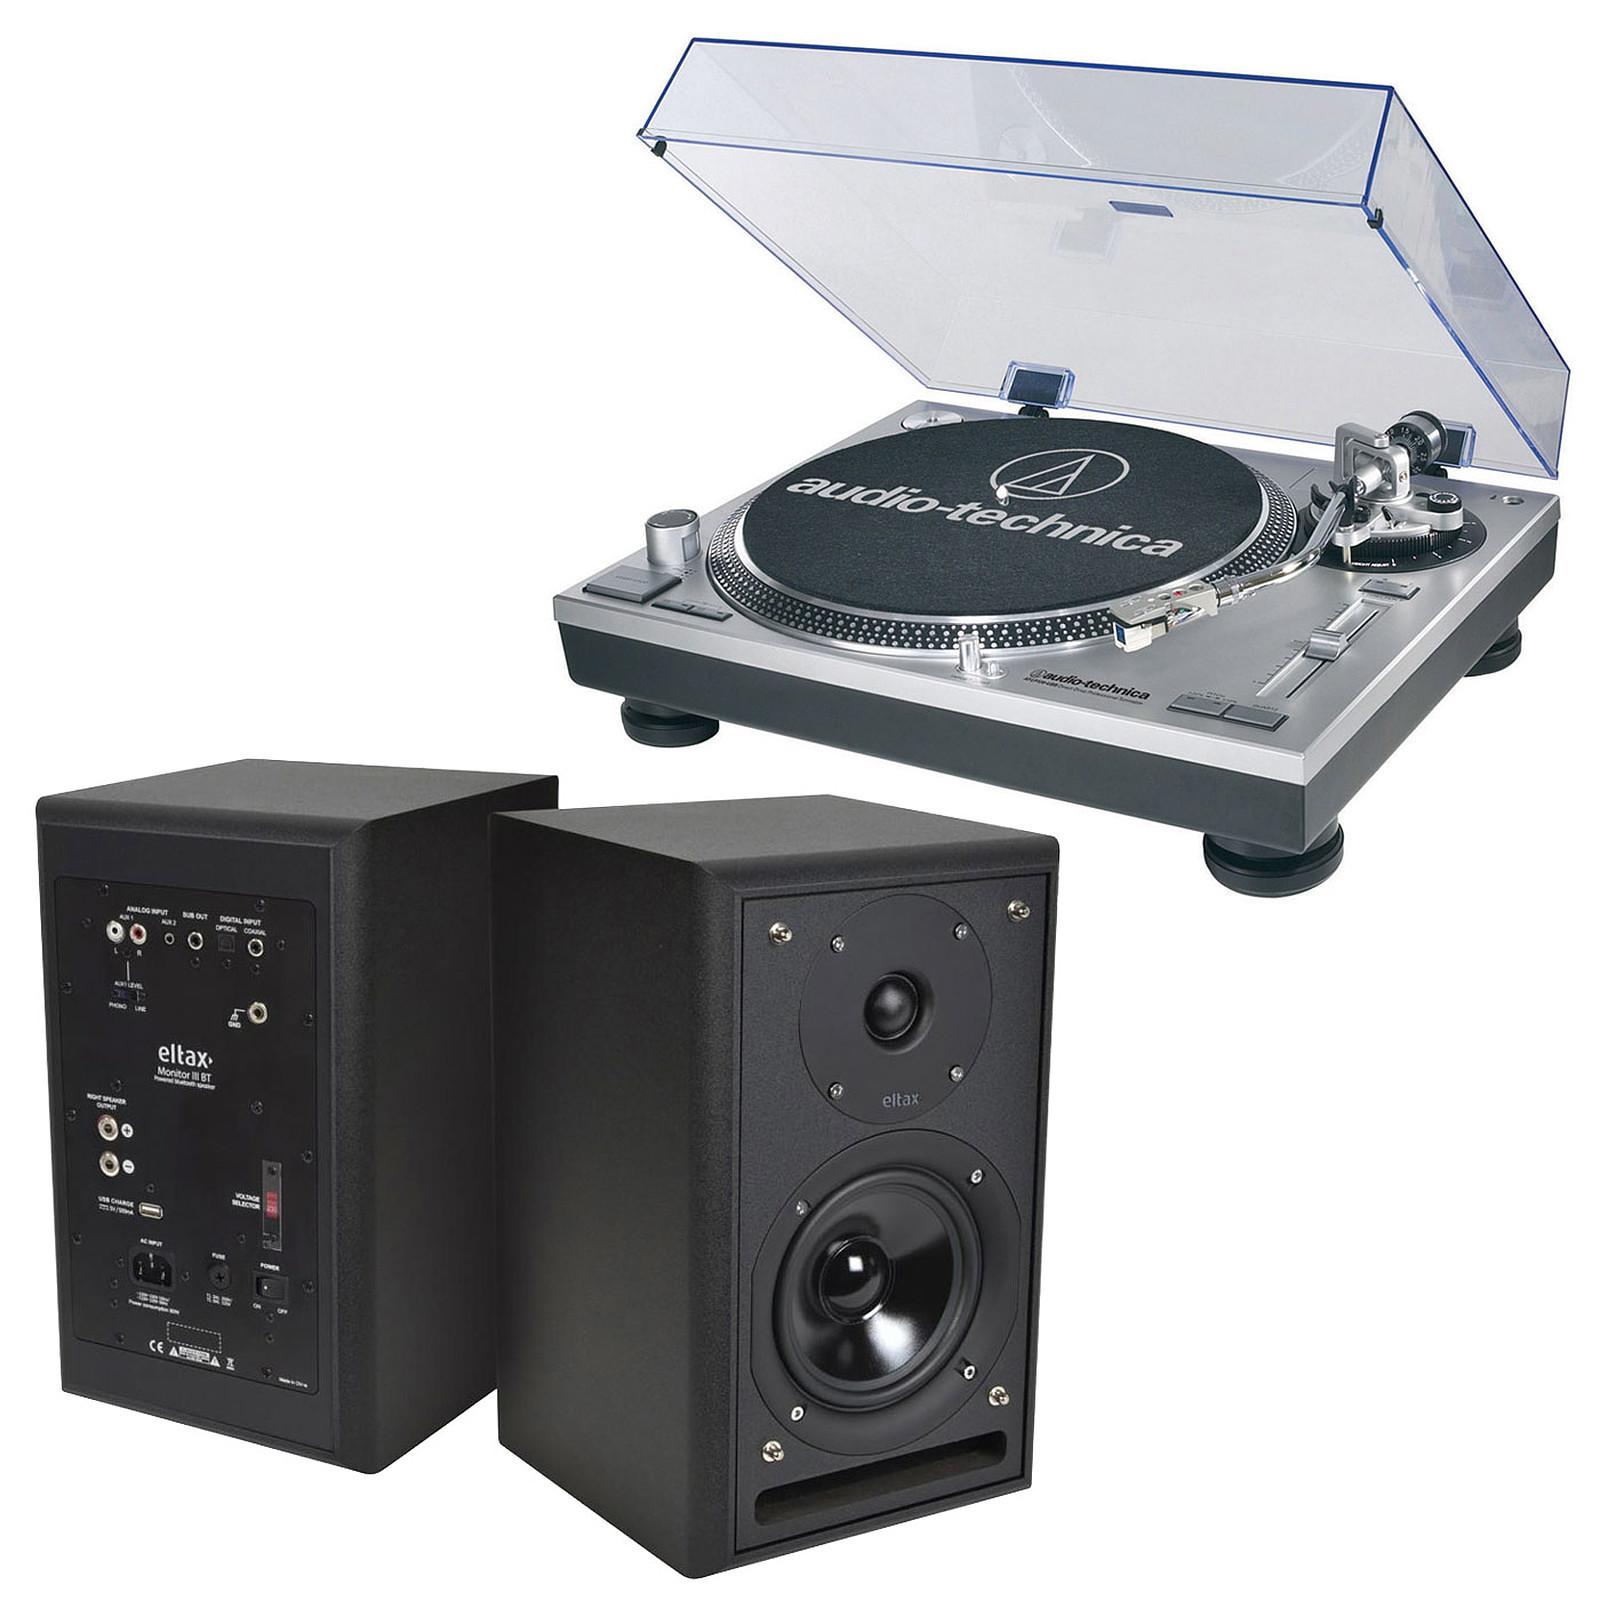 Audio-Technica AT-LP120USBHC + Eltax Monitor III BT Phono Noir